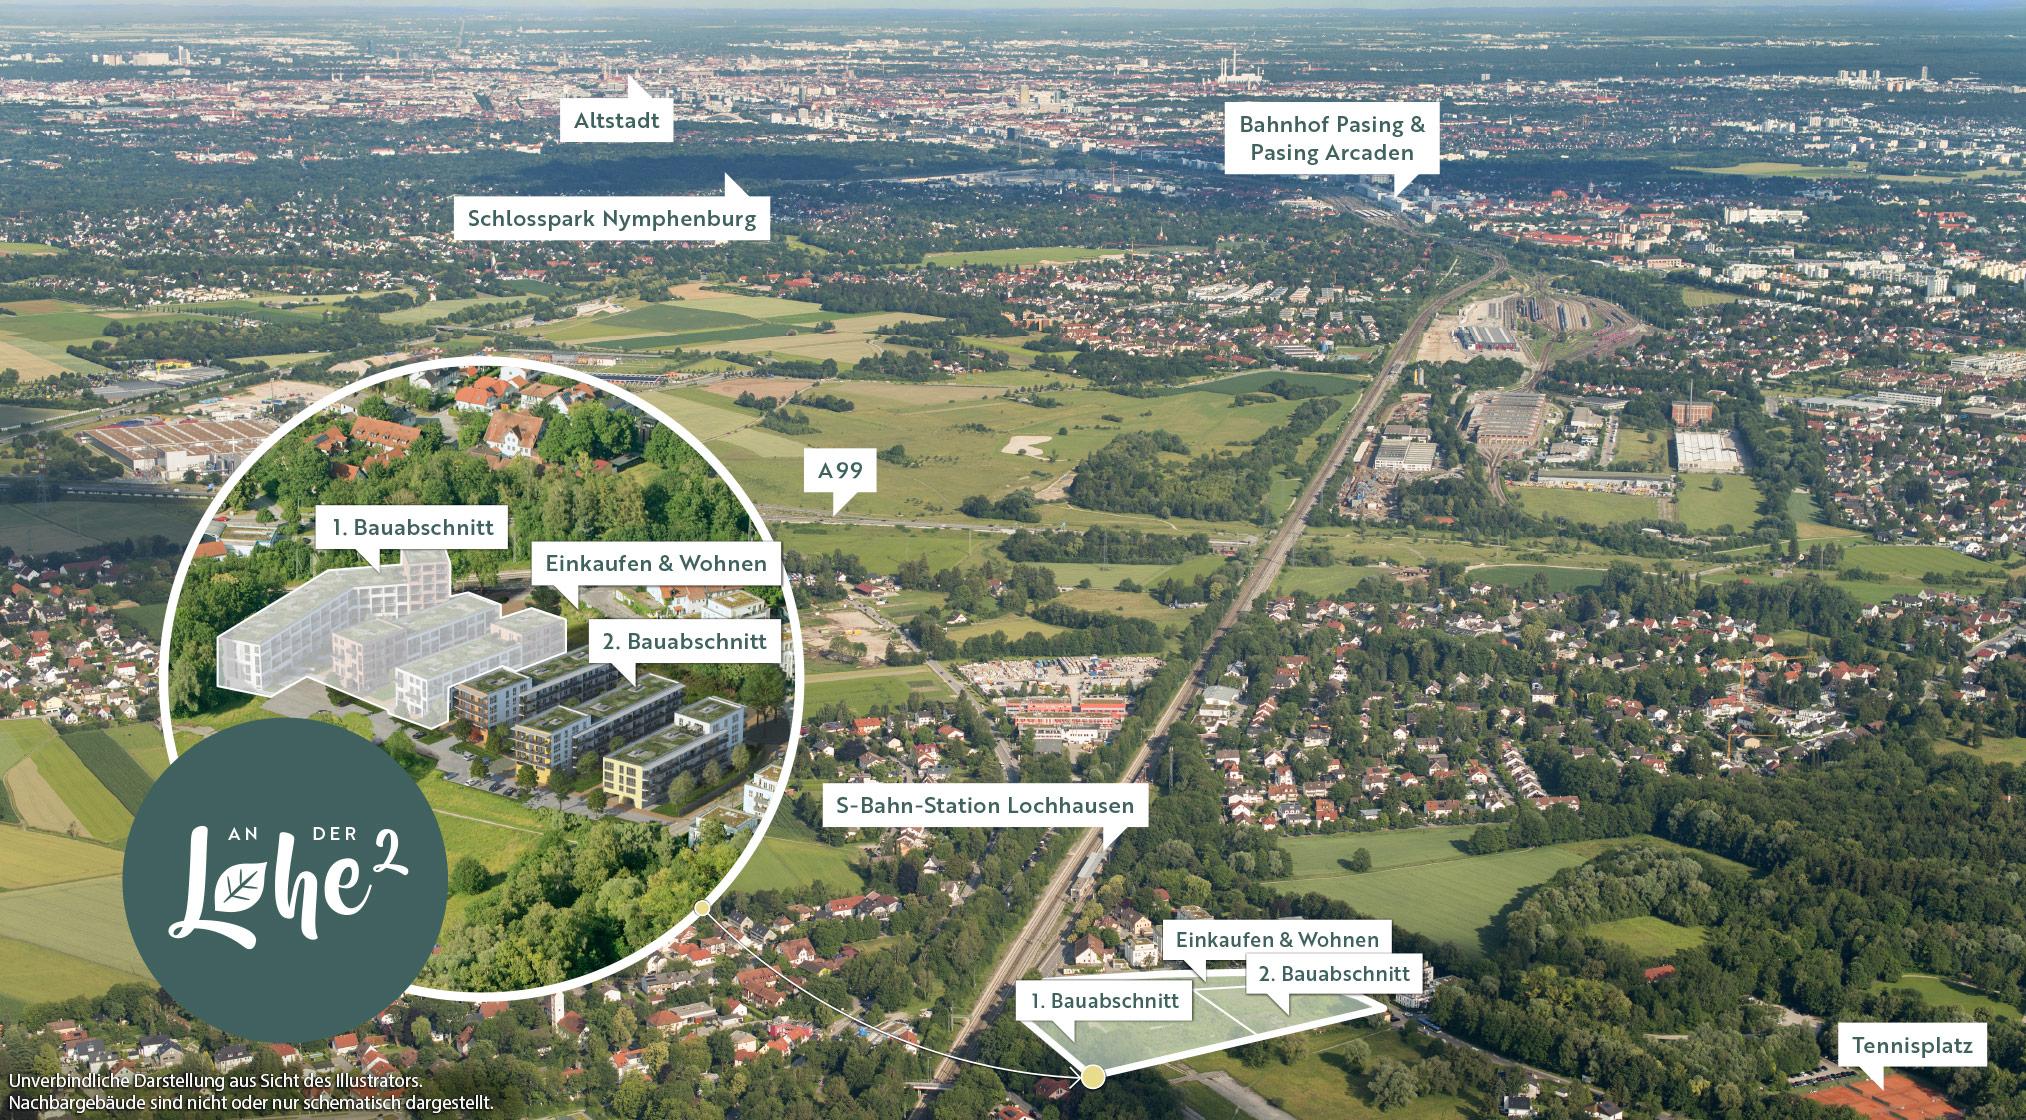 Immobilie An der Lohe 2 - Luftbild 2